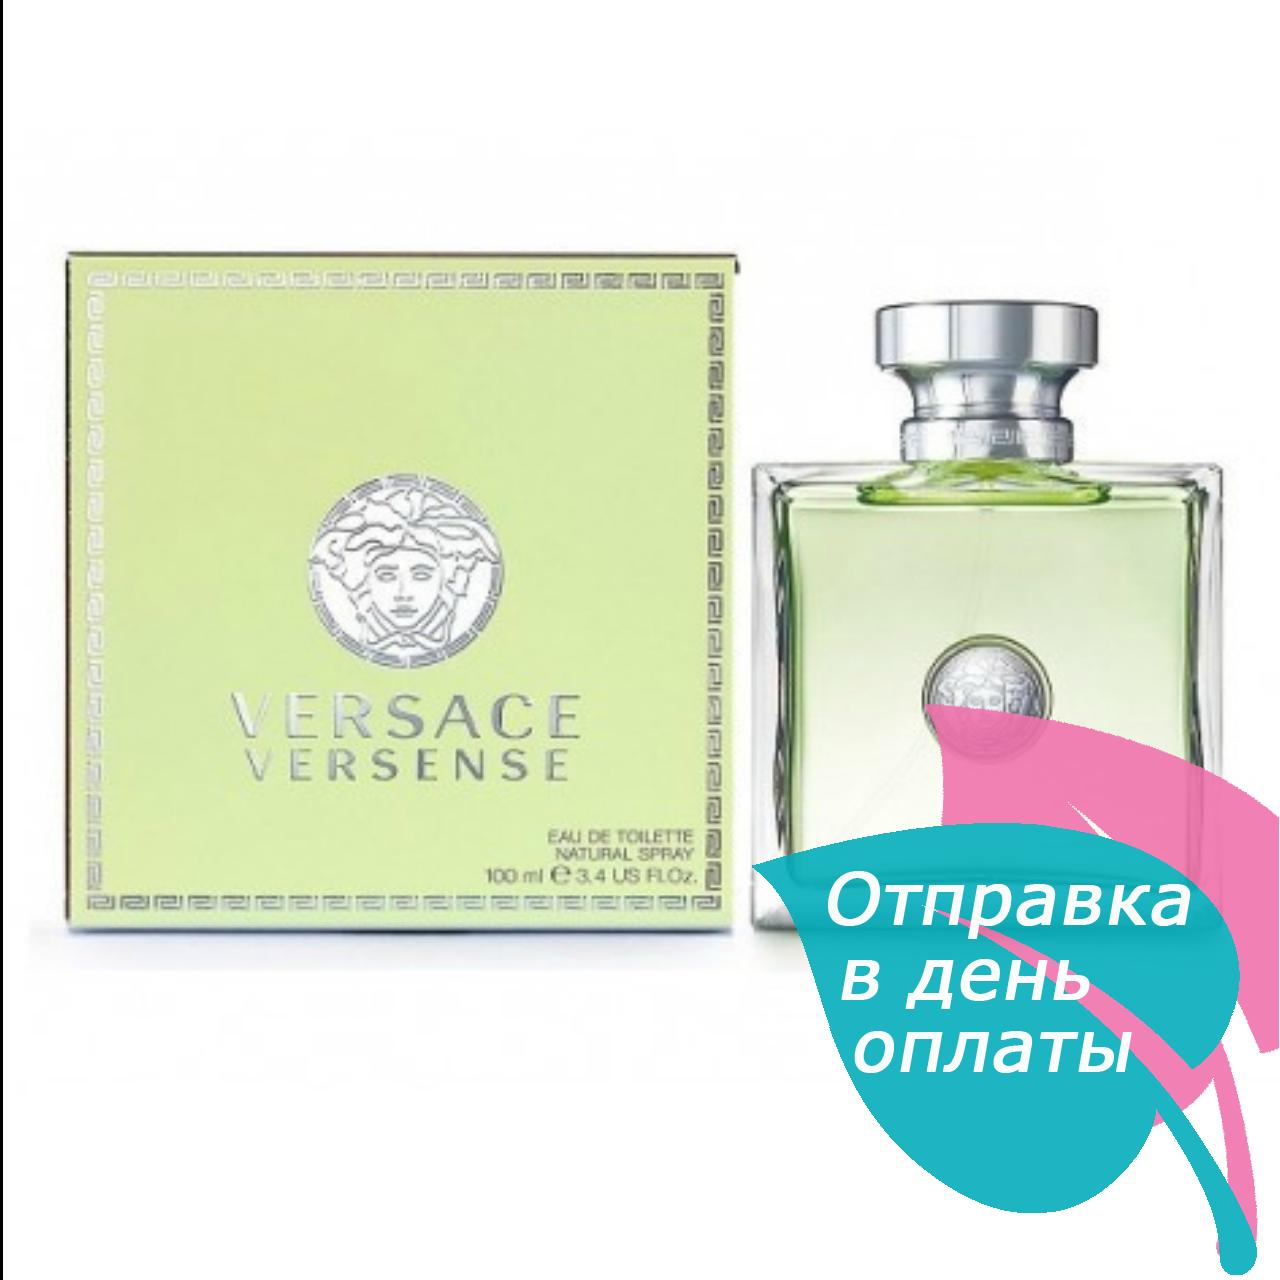 Женская туалетная вода Versace Versense  продажа ebc7cf6908e5f